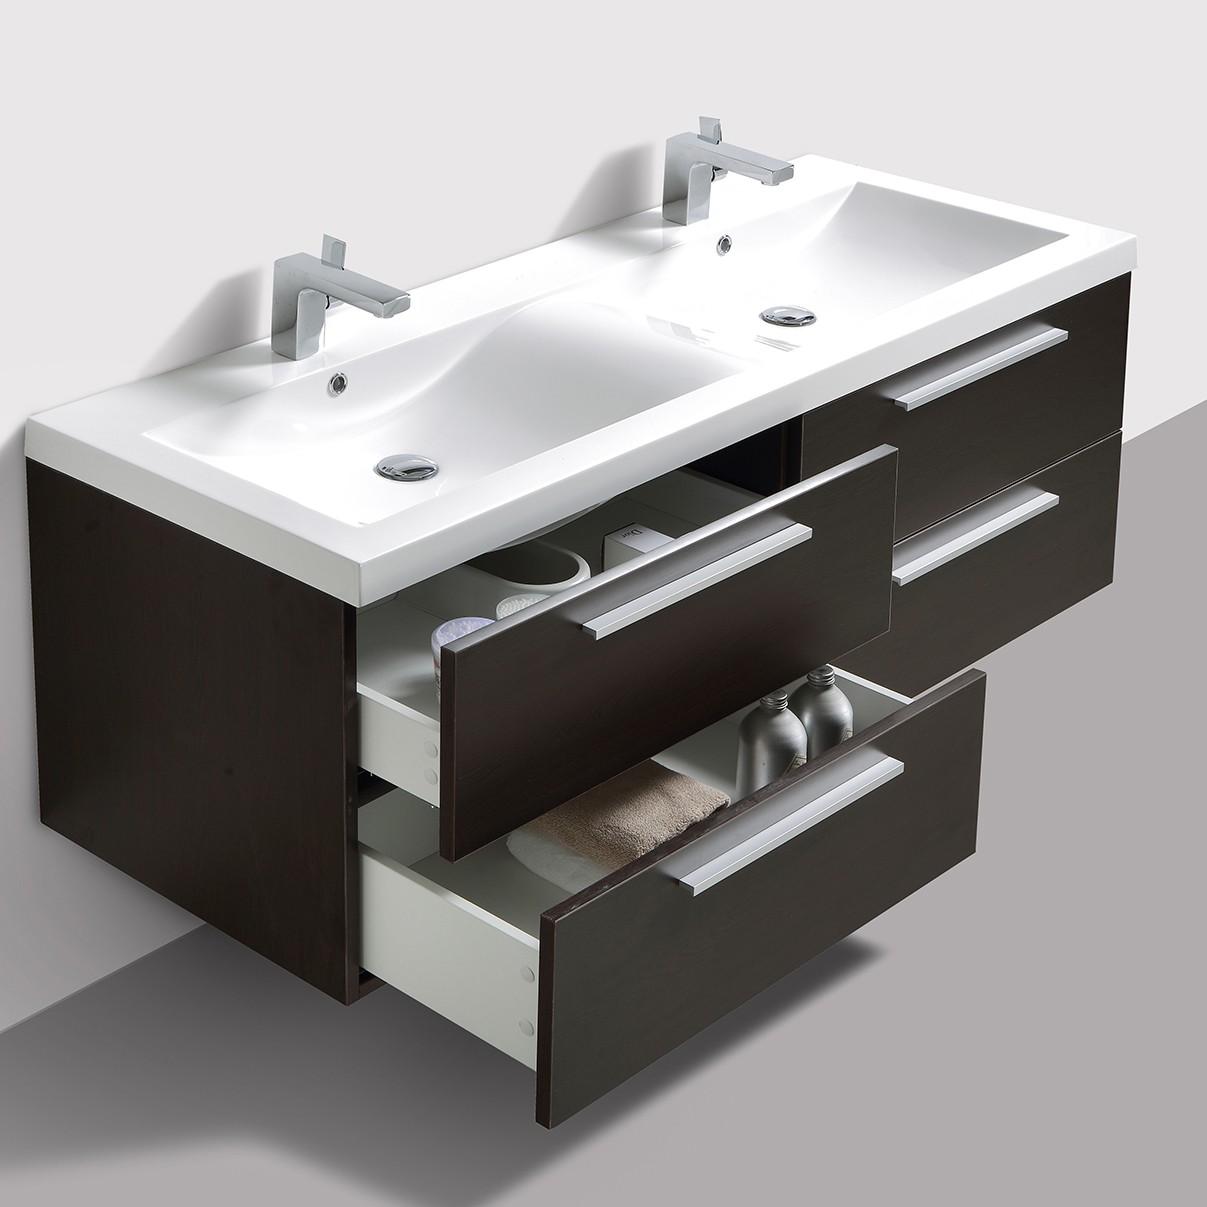 Badm belset sydney doppelwaschtisch spiegelschrank for Spiegelschrank doppelwaschbecken